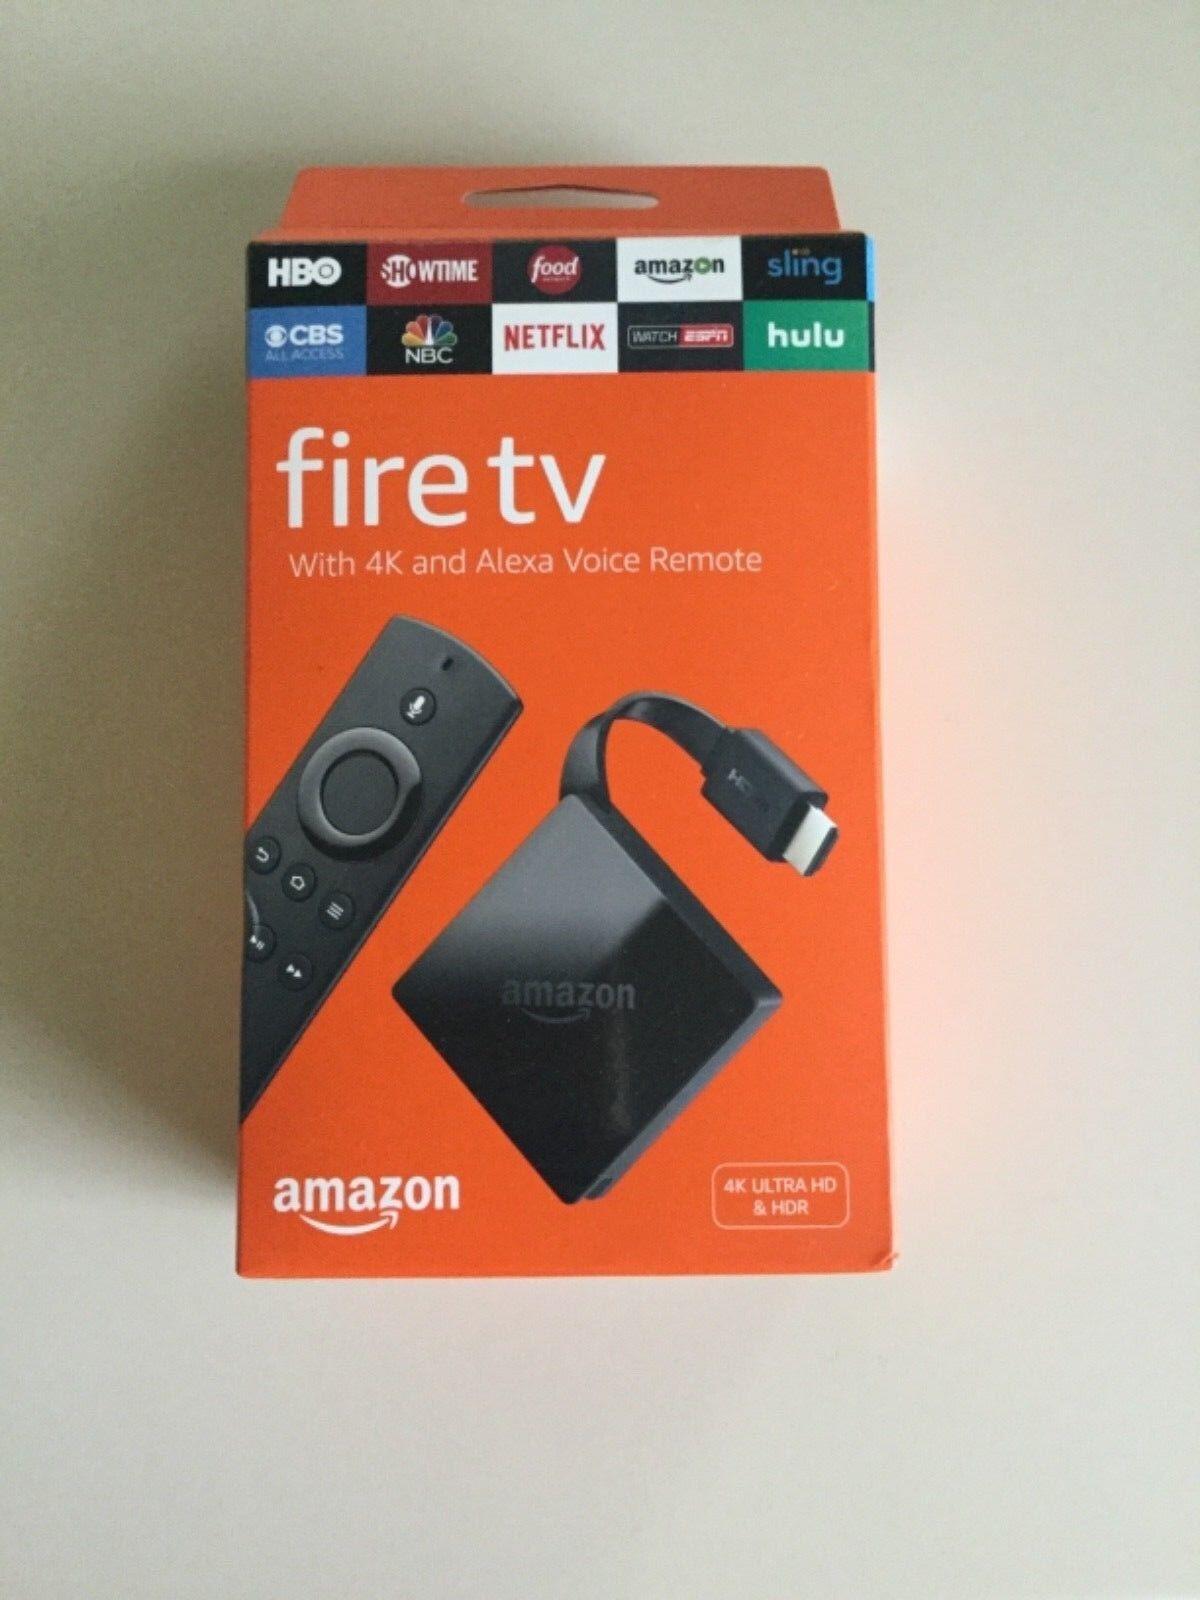 Amazon Fire TV (3rd Generation) Media Streamer - Black